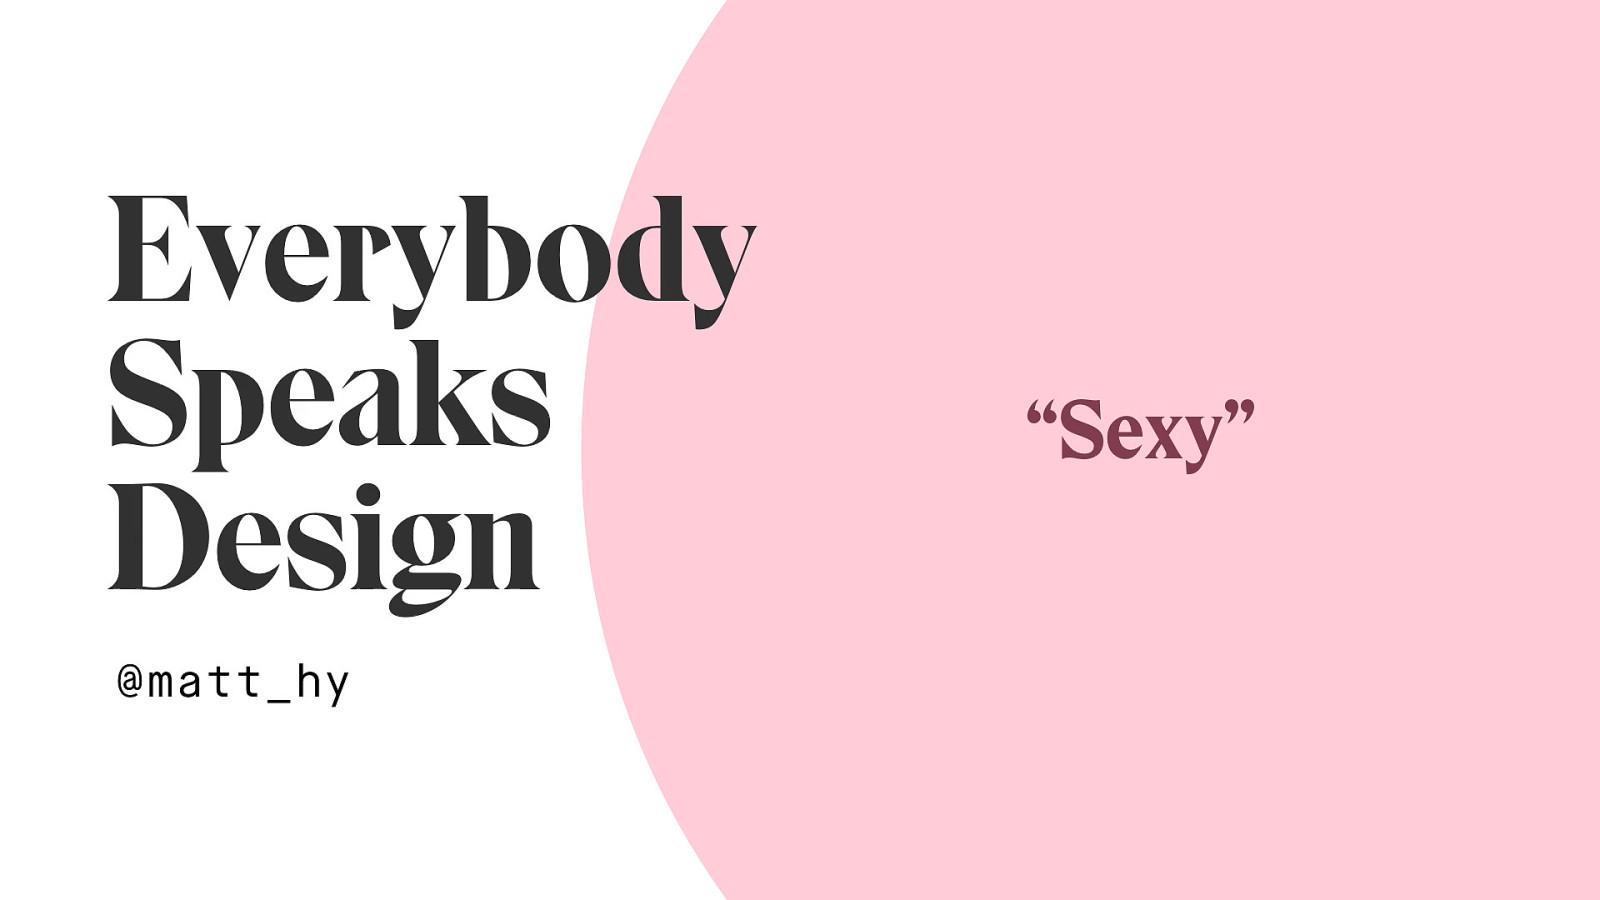 Everybody Speaks Design